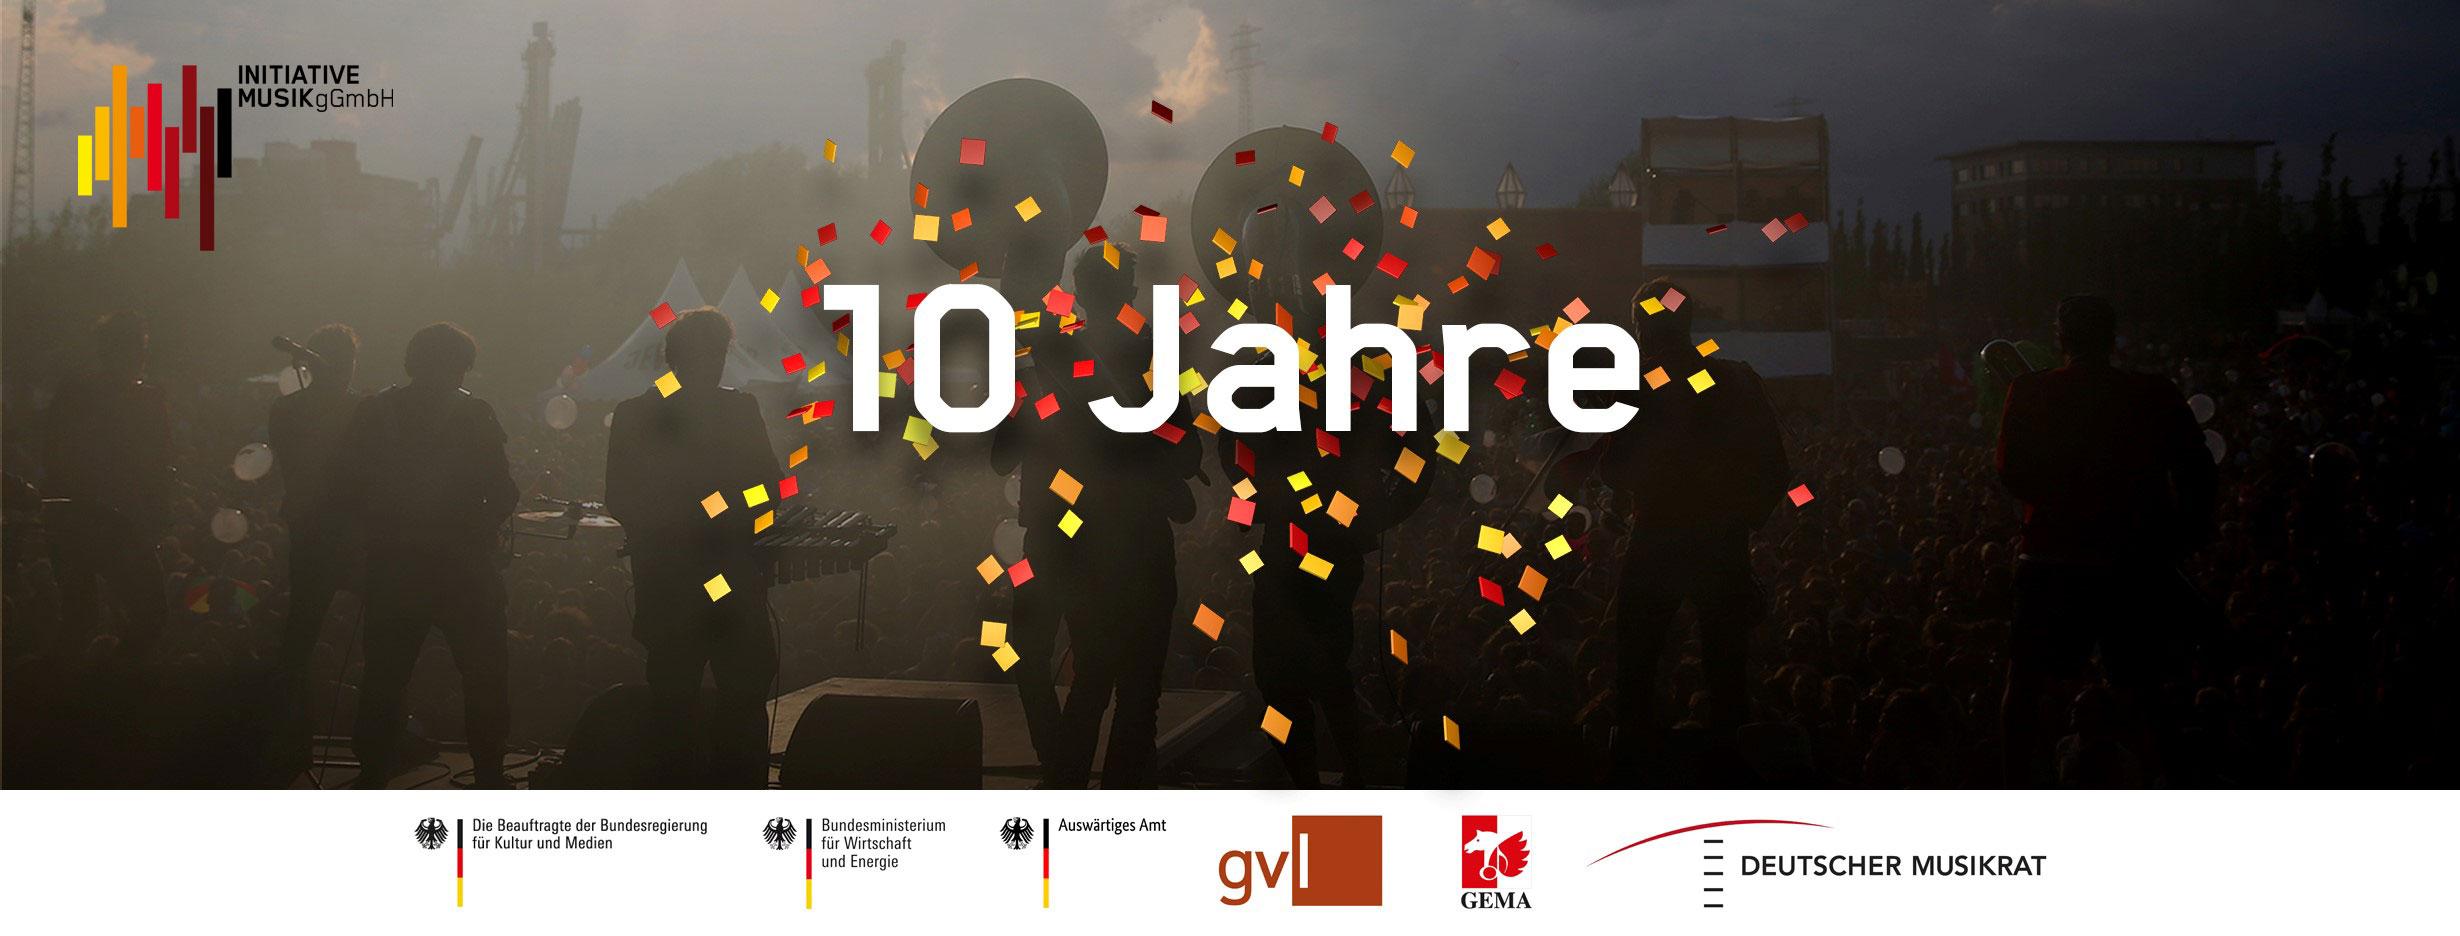 10 Jahre Initiative Musik